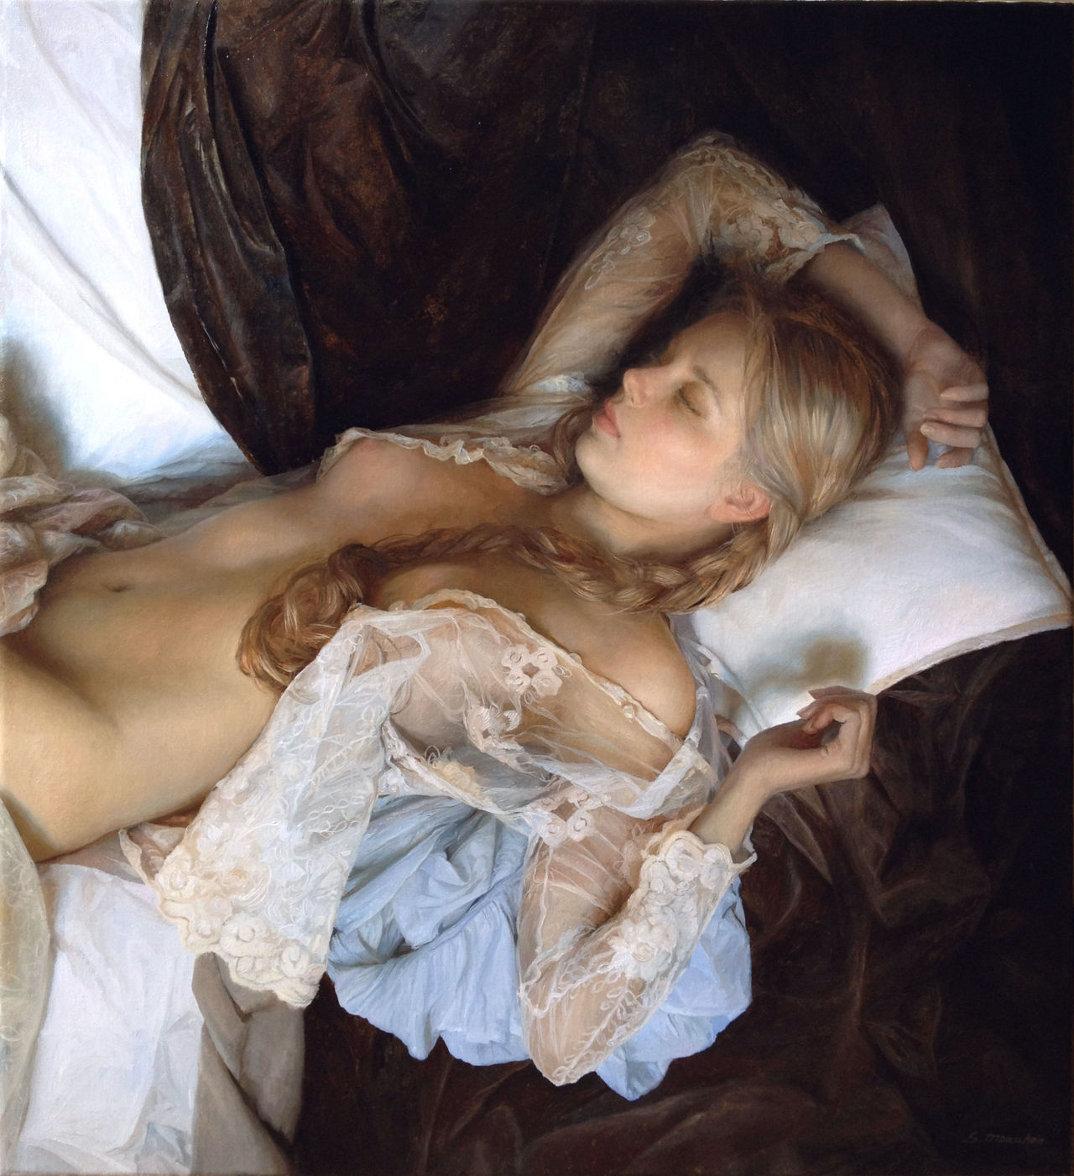 dipinti-olio-donne-seducenti-sensuali-sergei-marshennikov-17